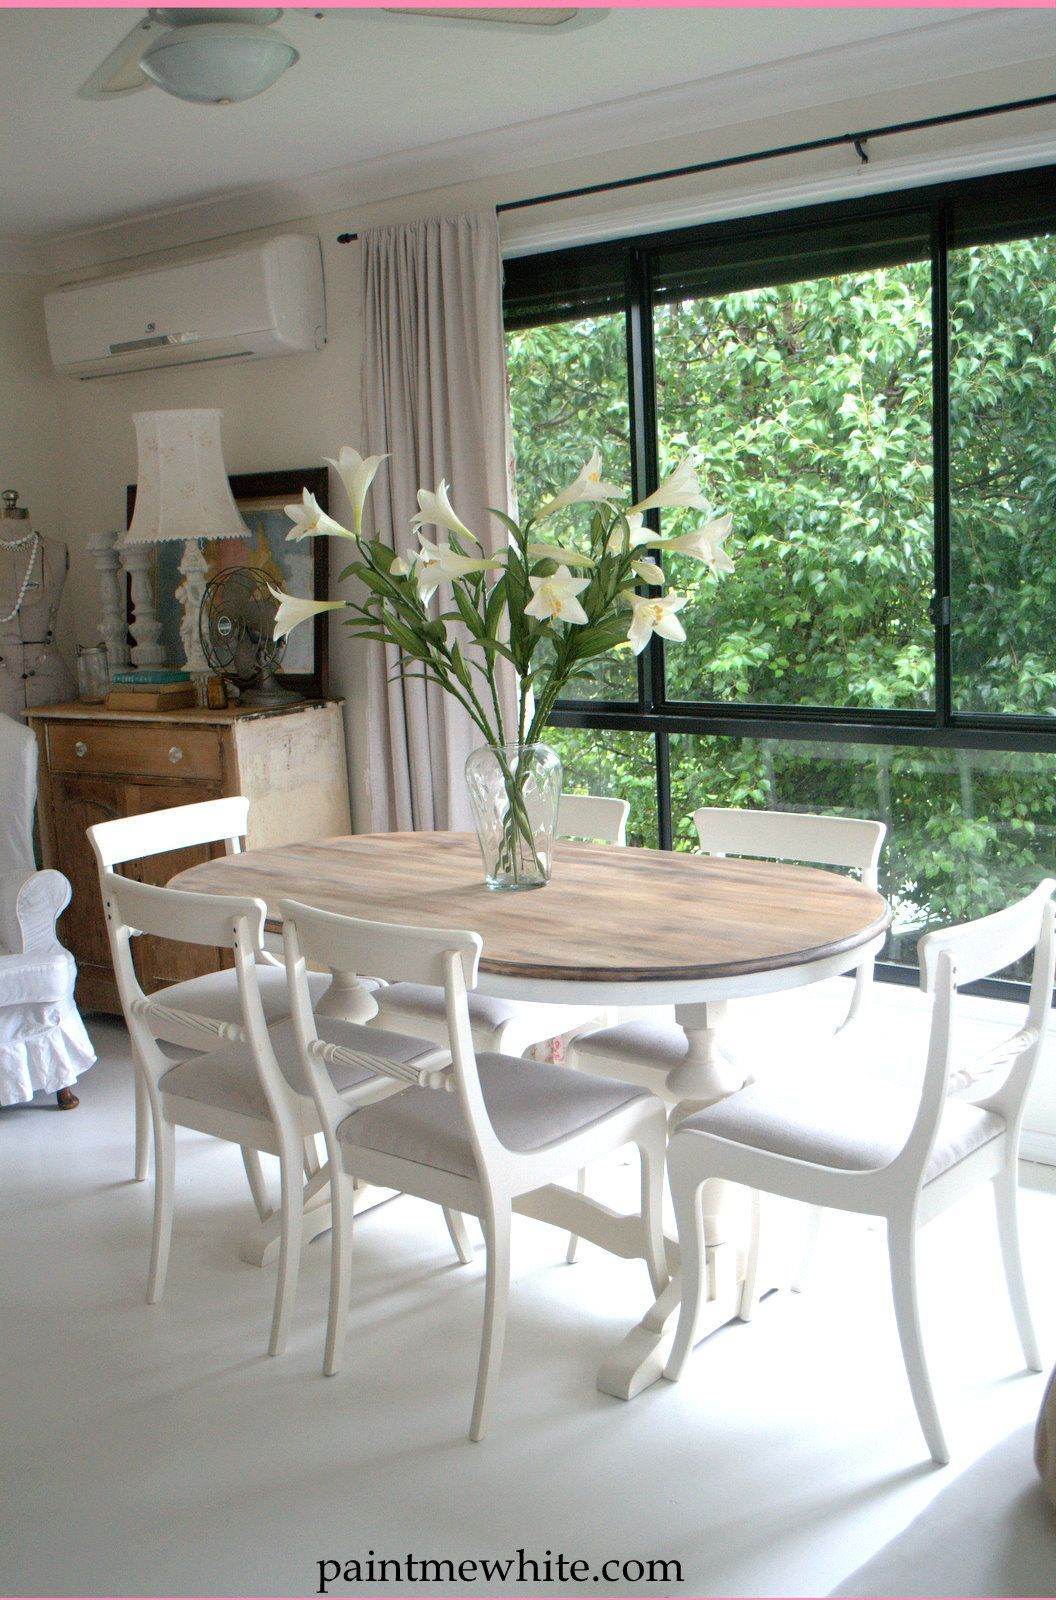 Separate Dining Room Design Ideas: 30 Beautiful Dining Room Decorating Ideas, Furniture